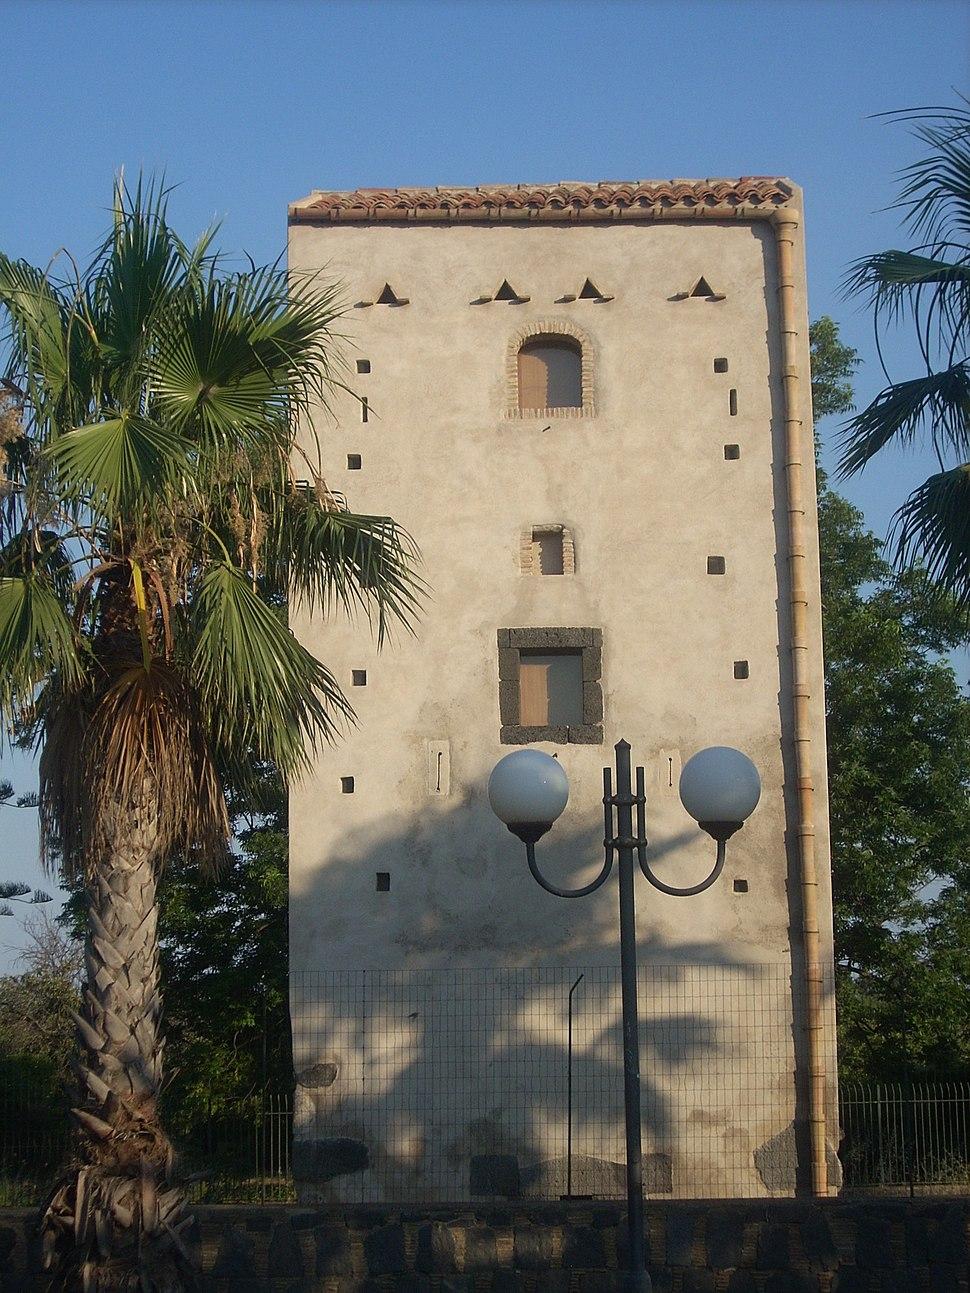 Vignazzi Tower